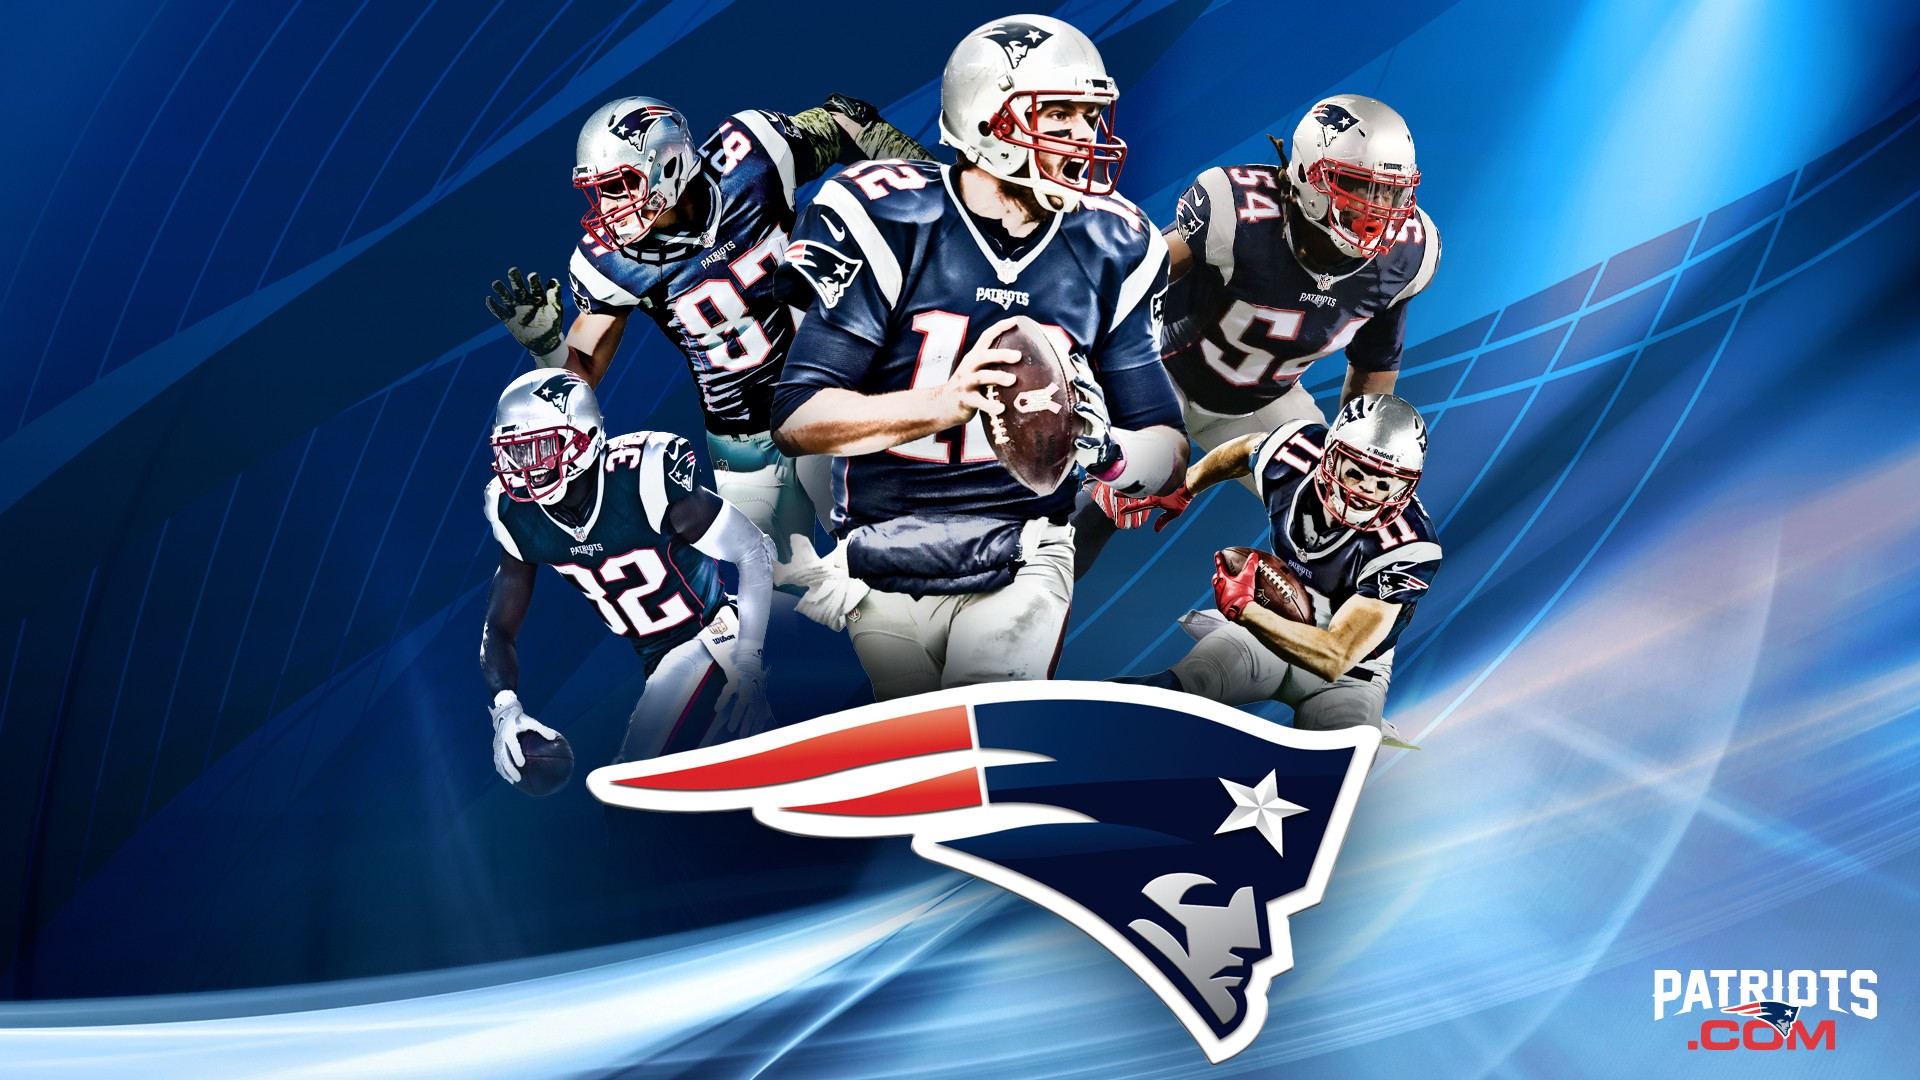 New England Patriots Wallpaper ·① Download Free High